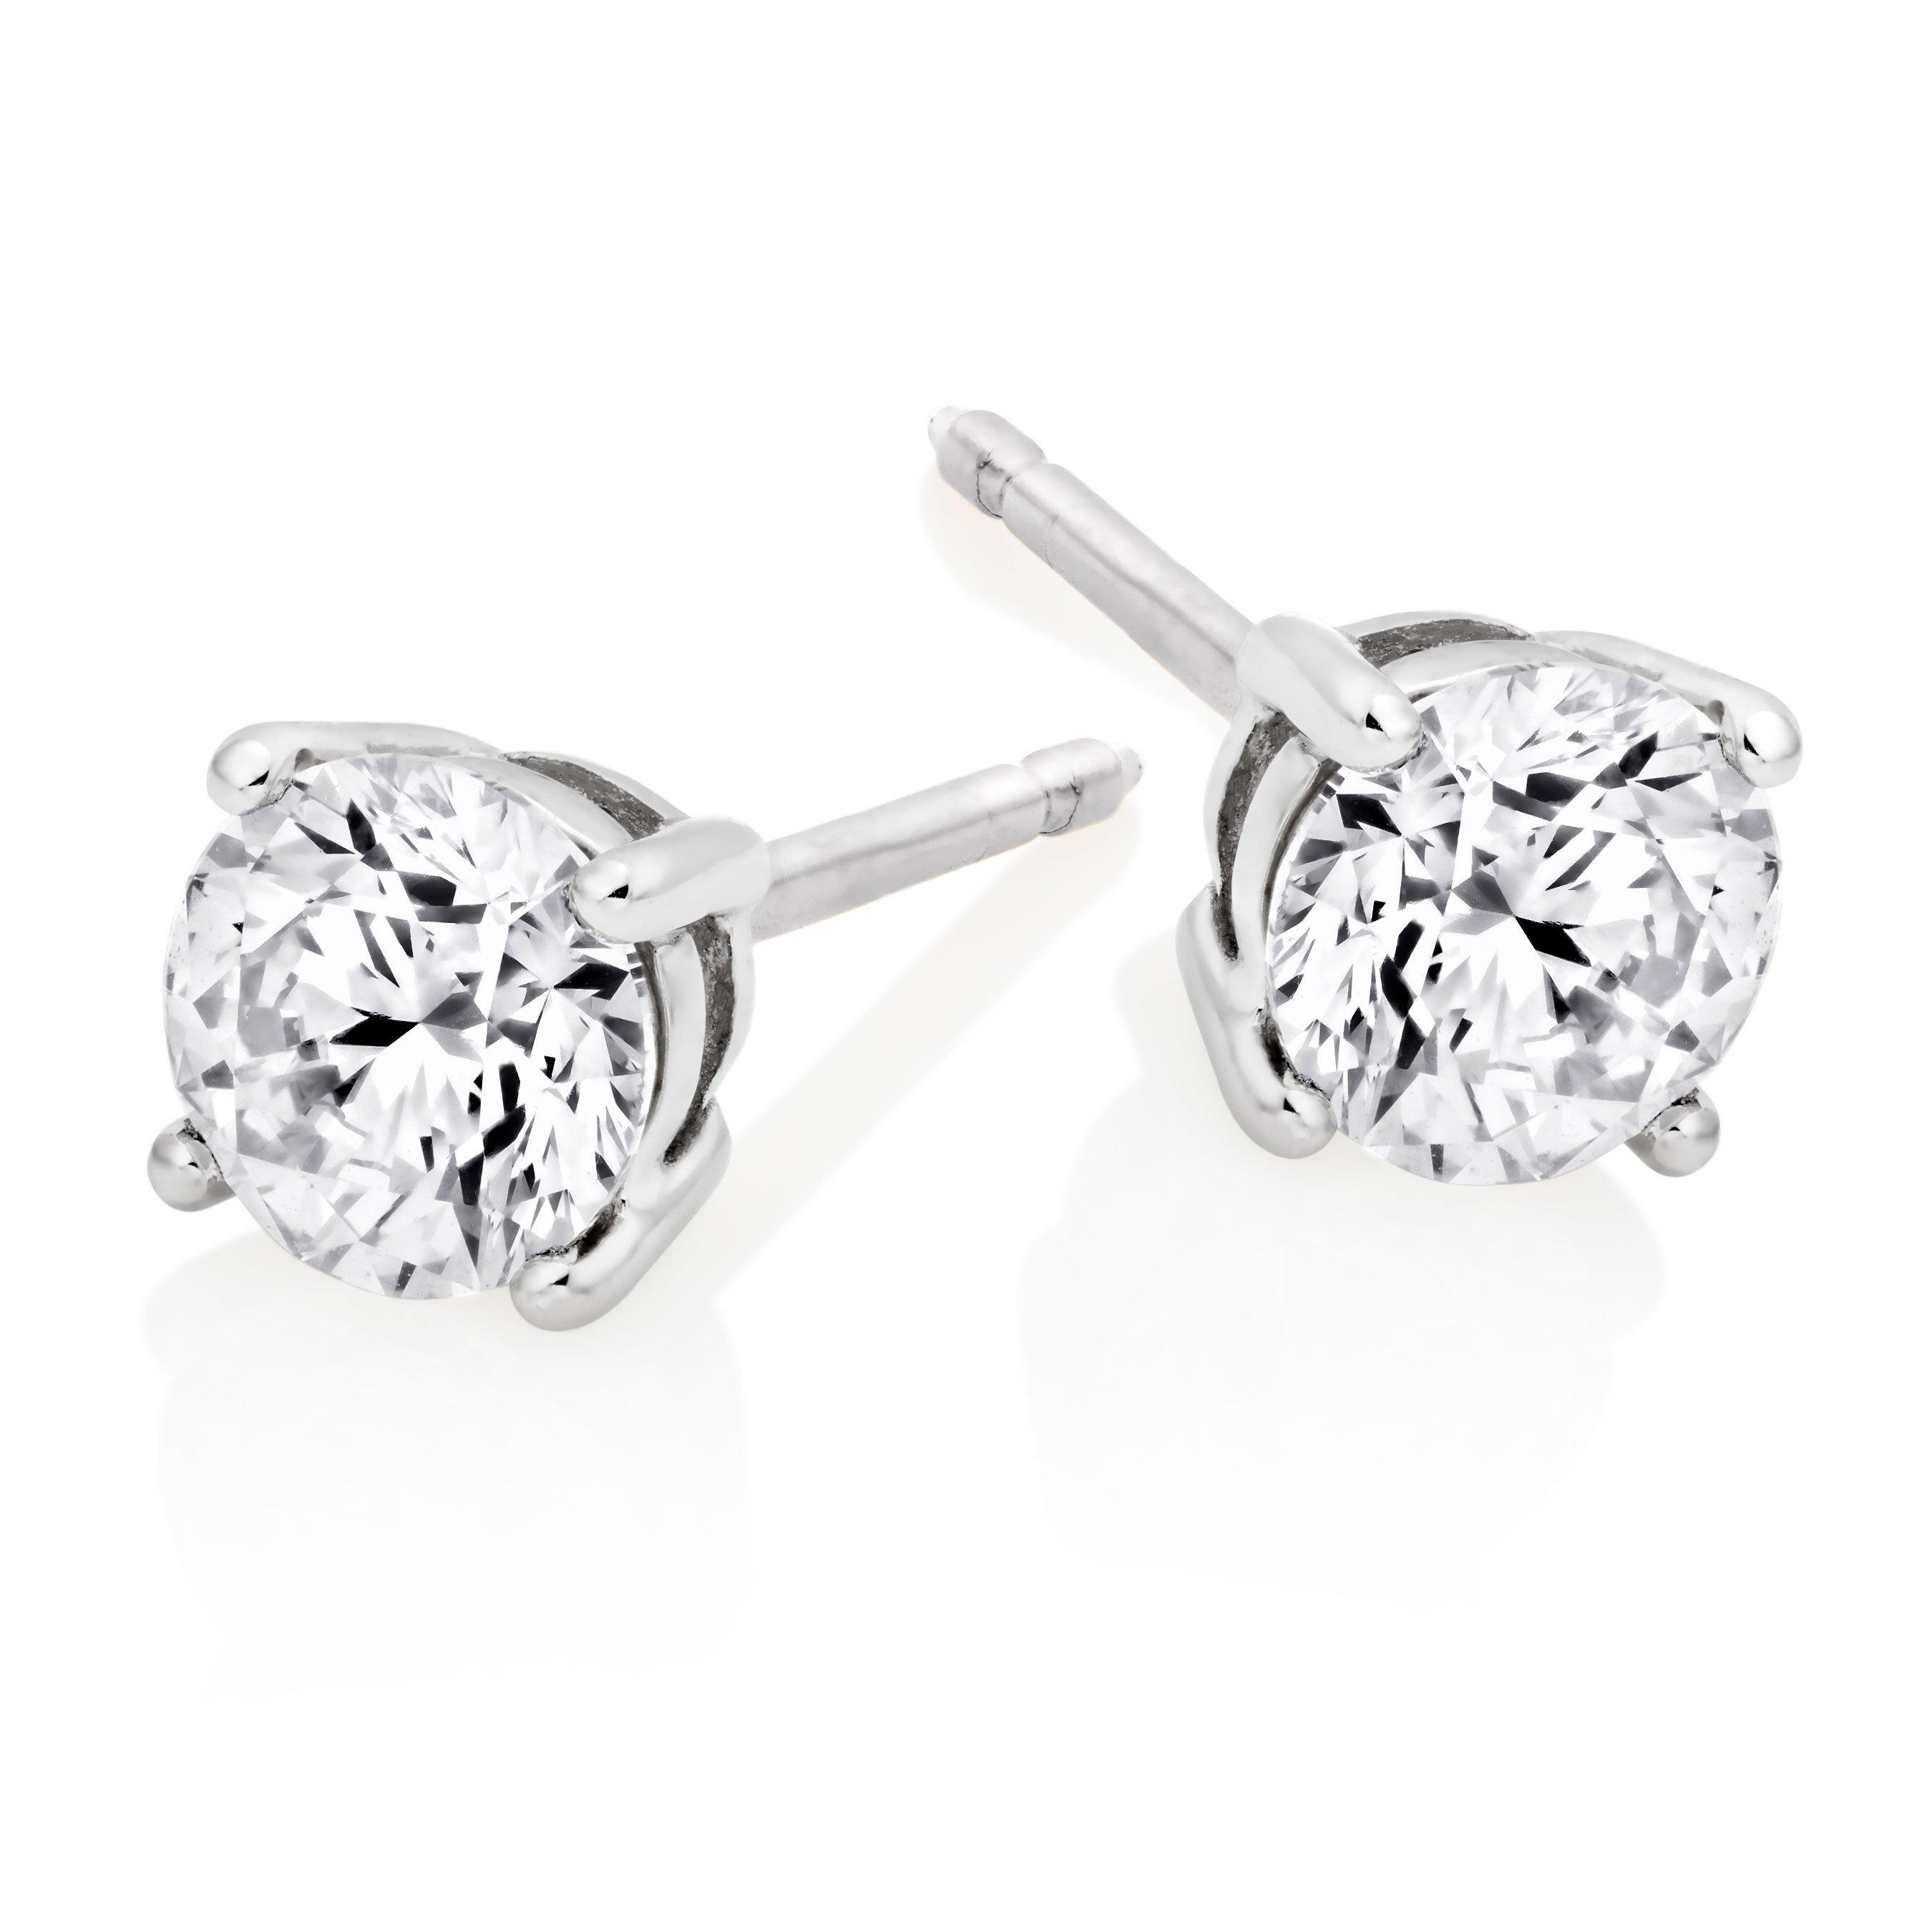 18ct White Gold Diamond Earrings